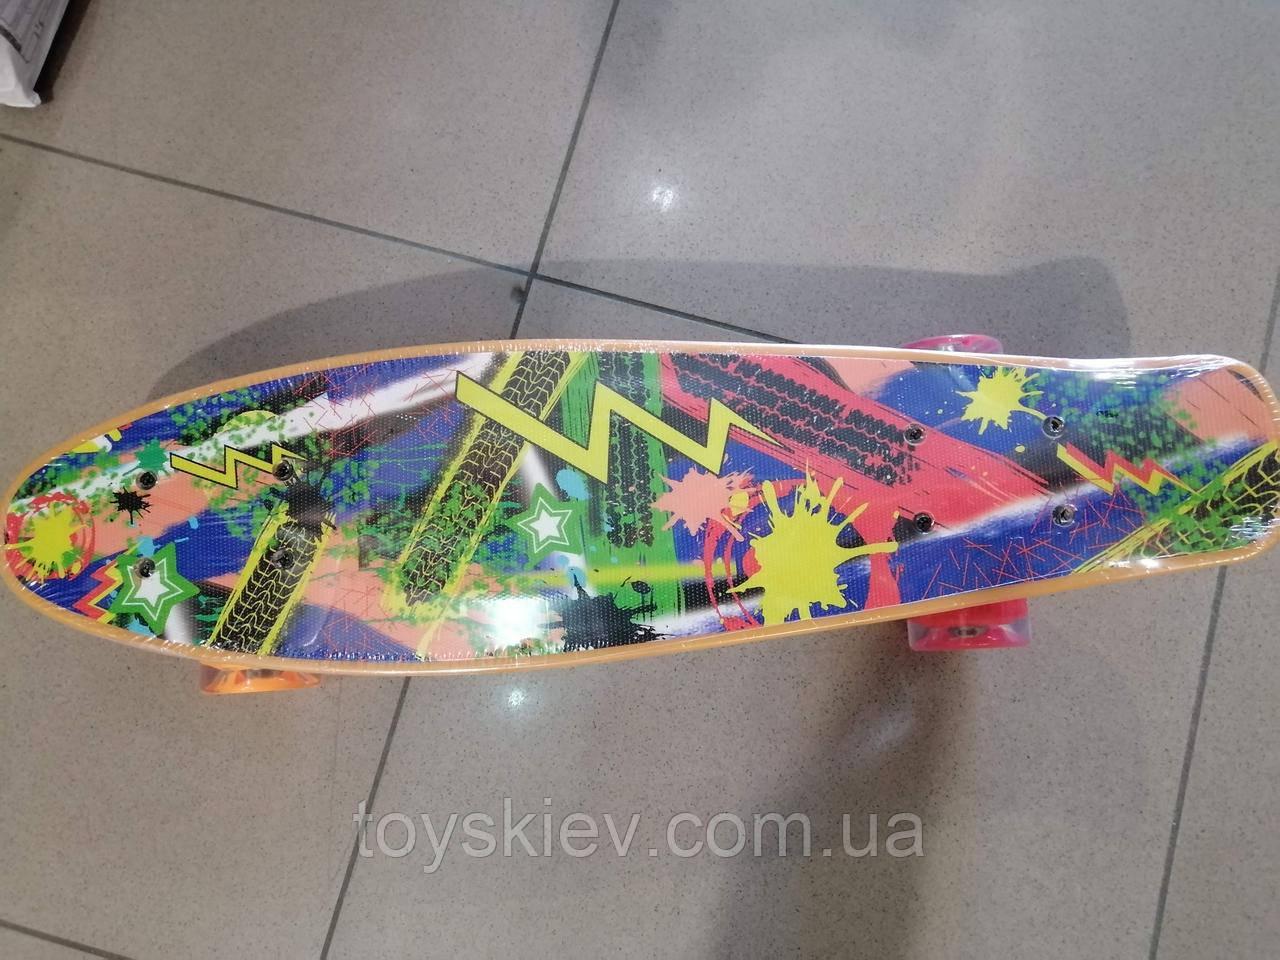 Скейт Пенни борд (Penny board) 820-32 с рисунком, светящийся